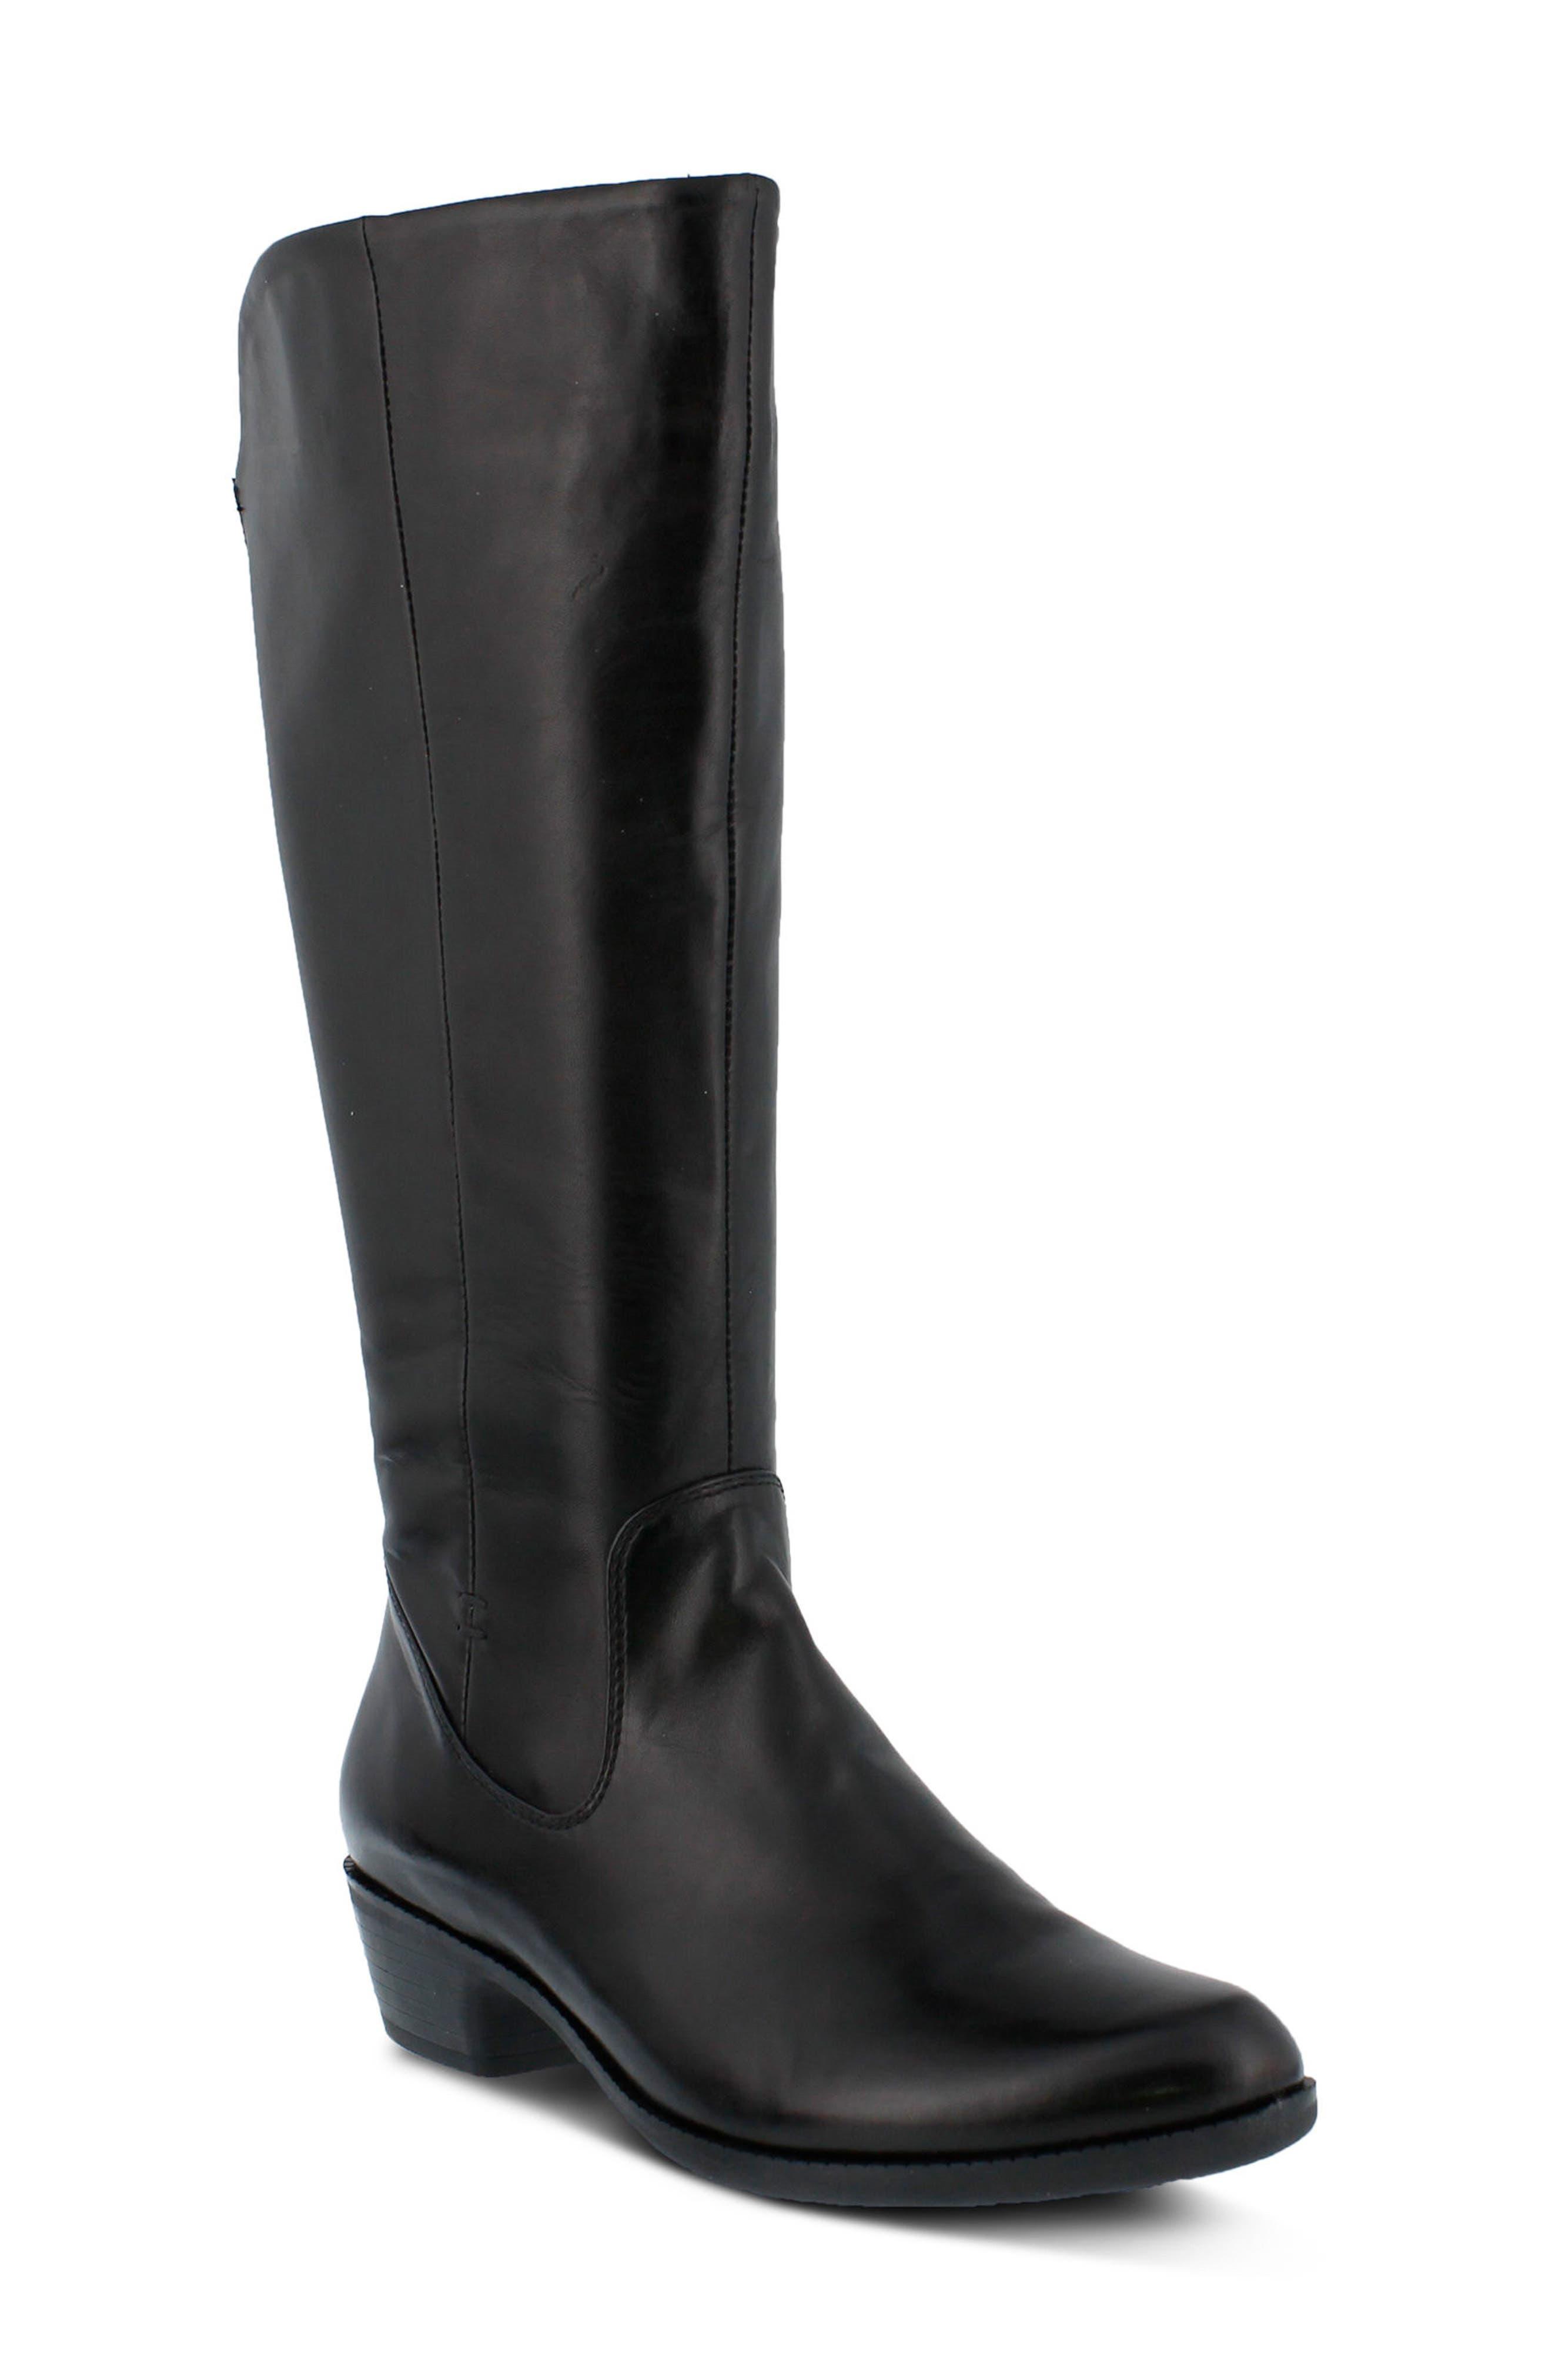 Bolah Tall Boot,                             Main thumbnail 1, color,                             Black Leather